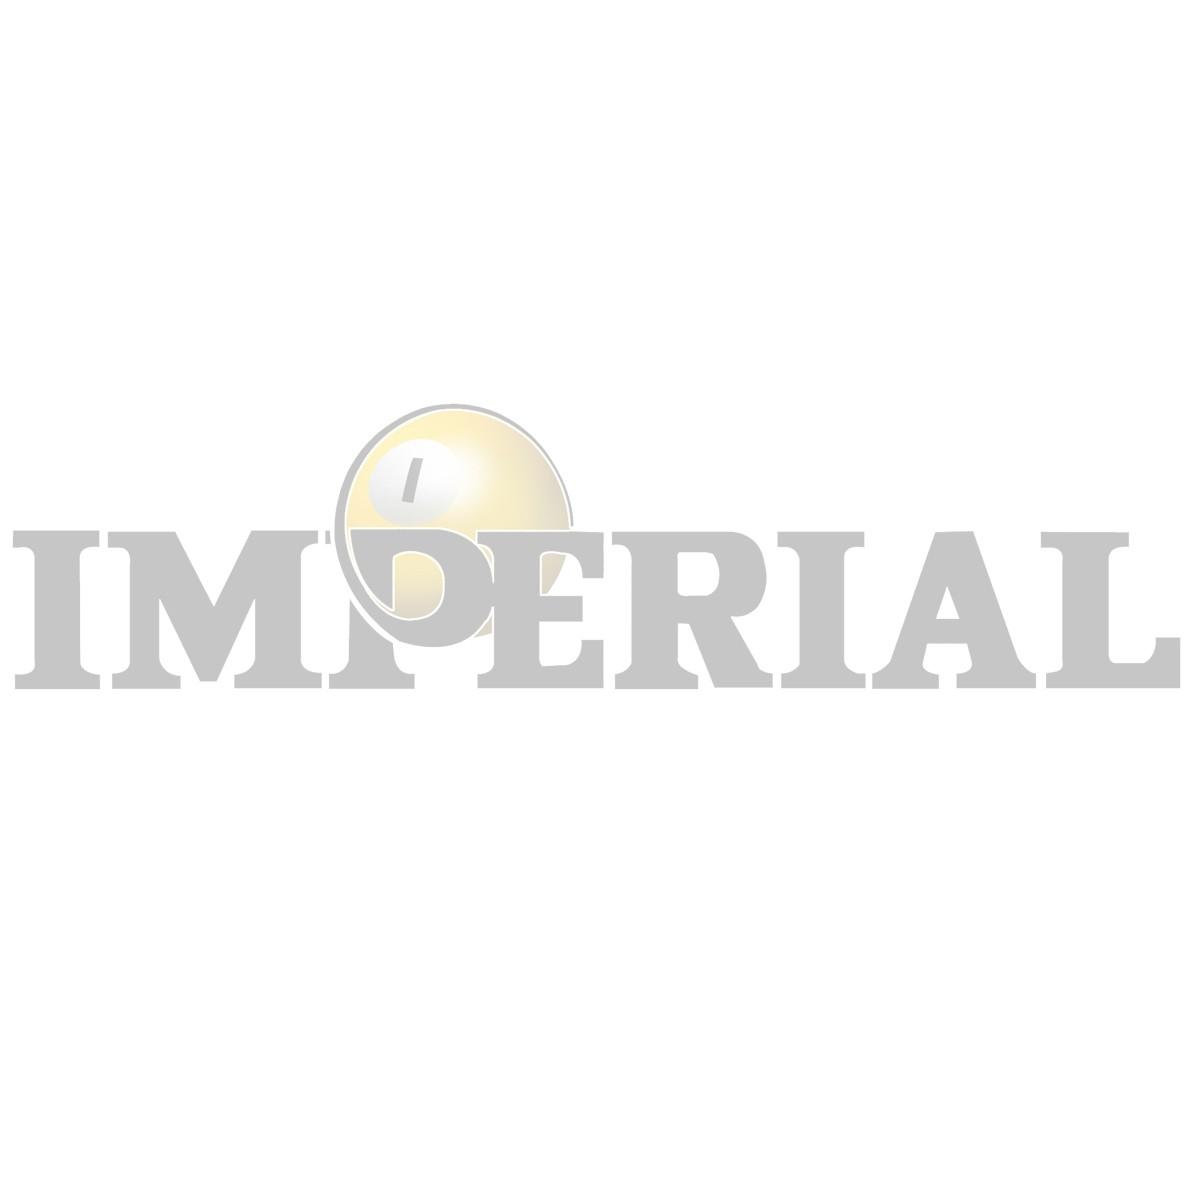 University of Missouri Home vs. Away Billiard Ball Set